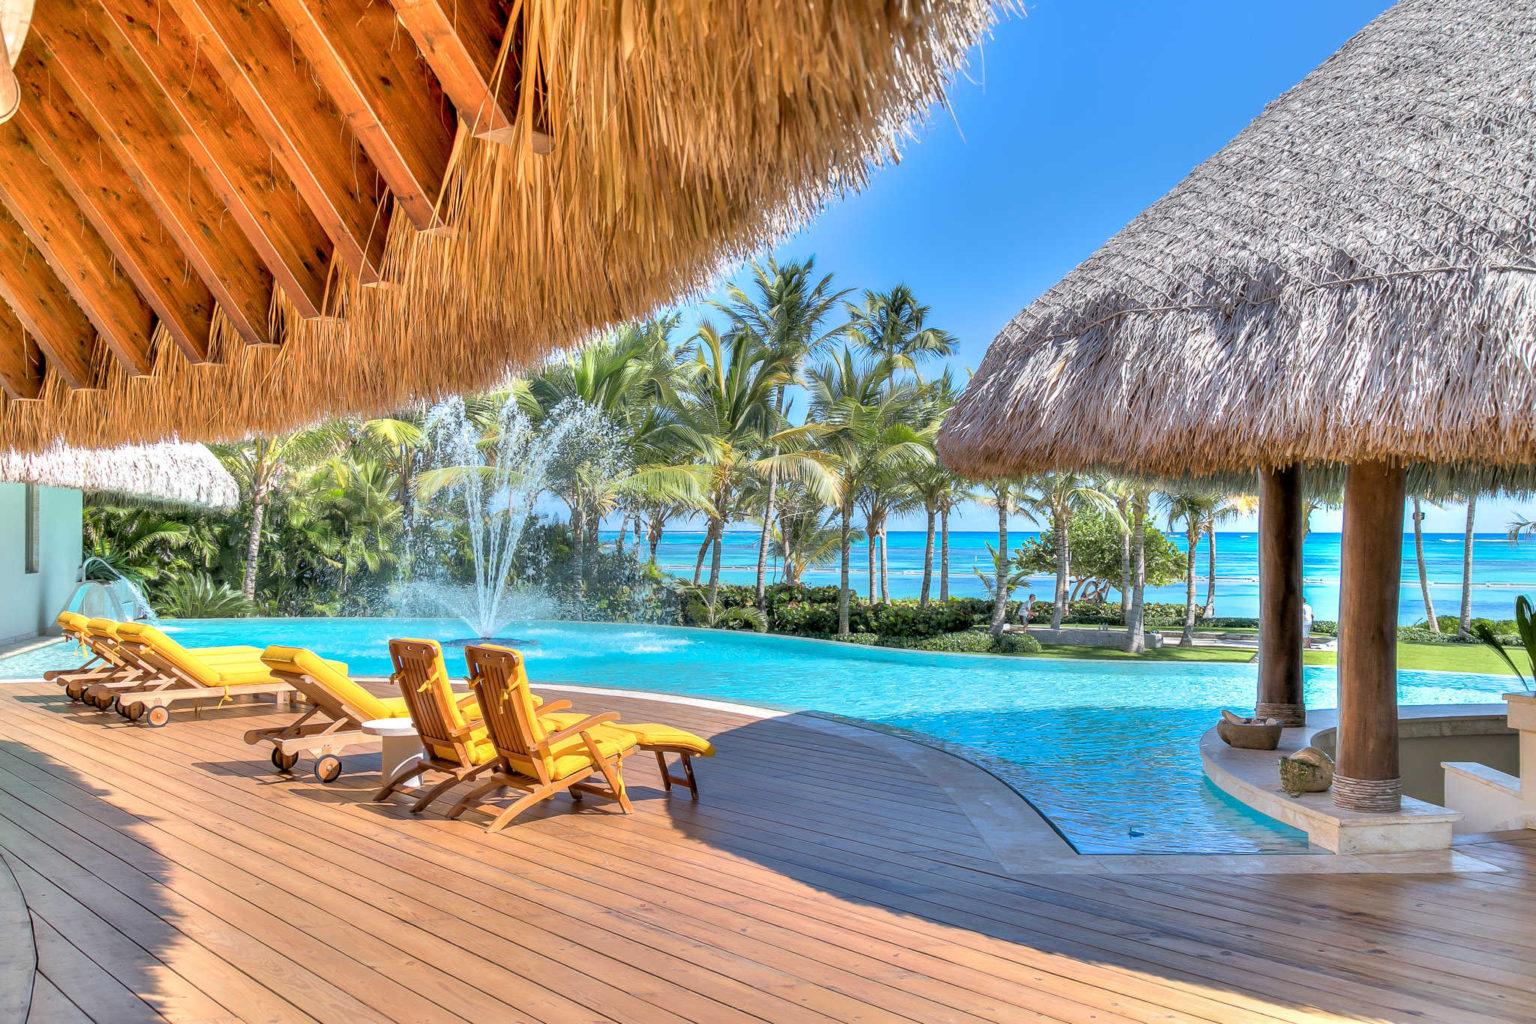 Villa sirena blue beachfront luxury retreat punta cana for Punta cana villa rentals